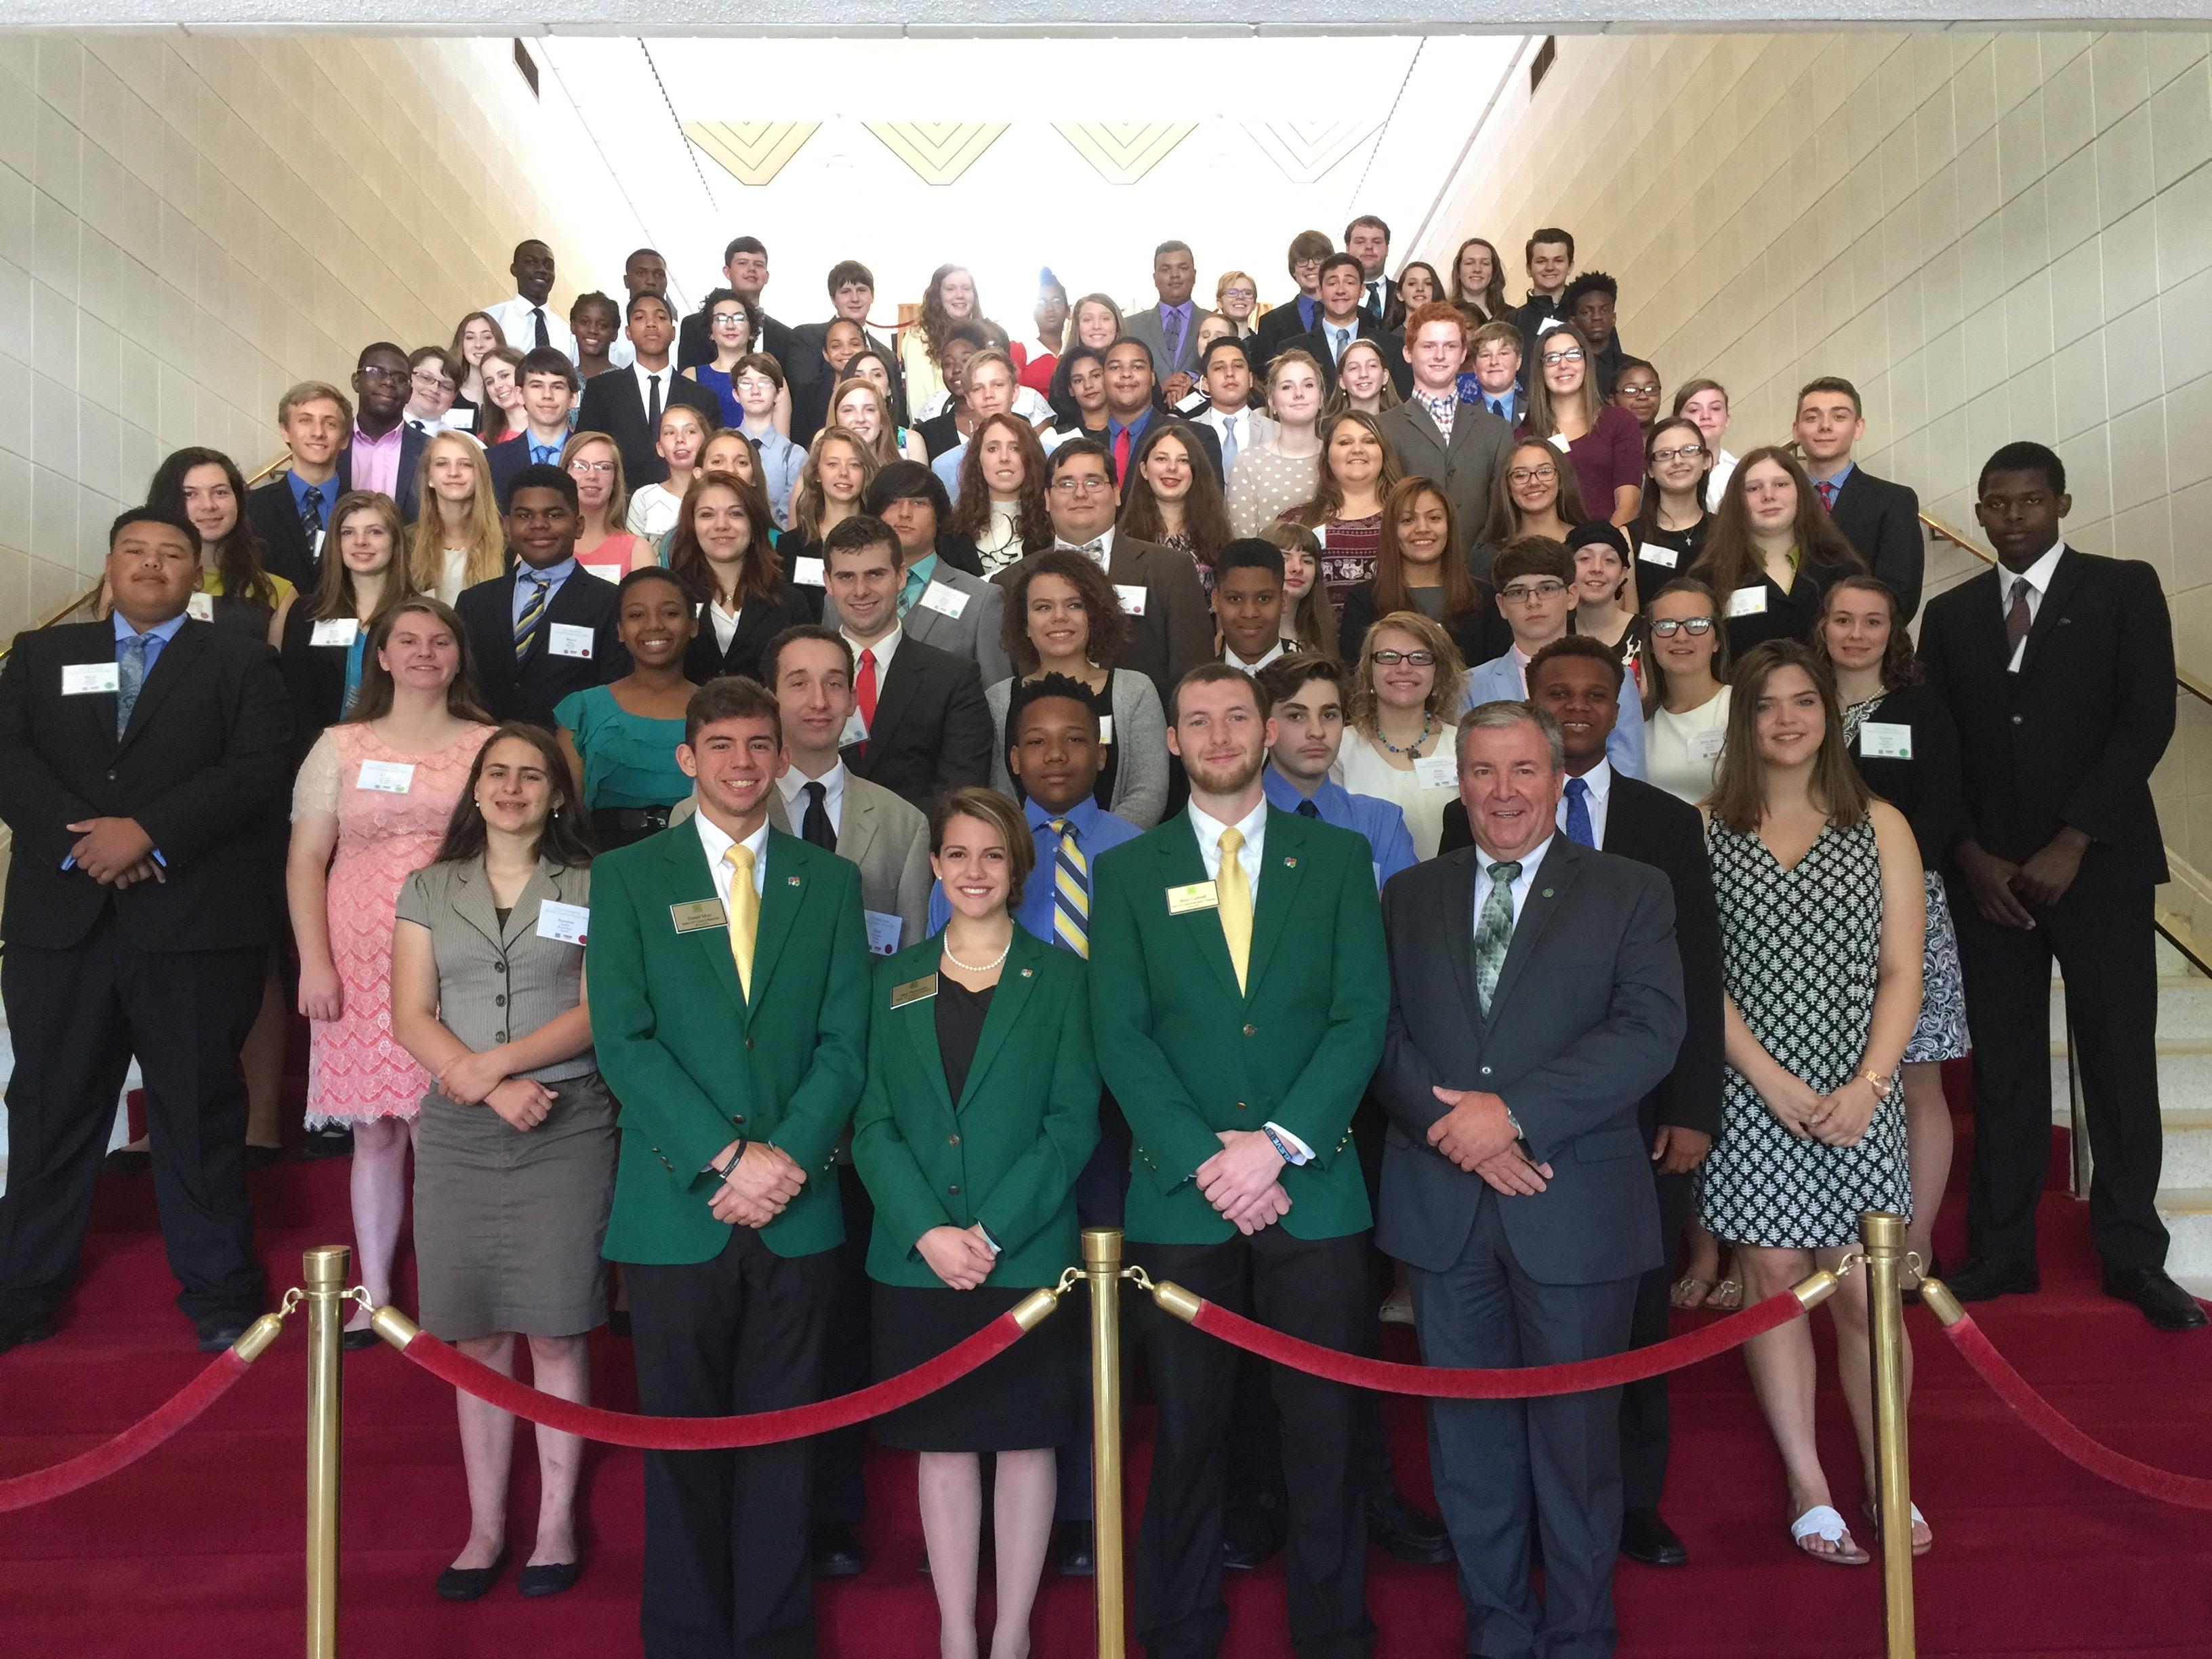 4-H Citizenship North Carolina Focus delegation